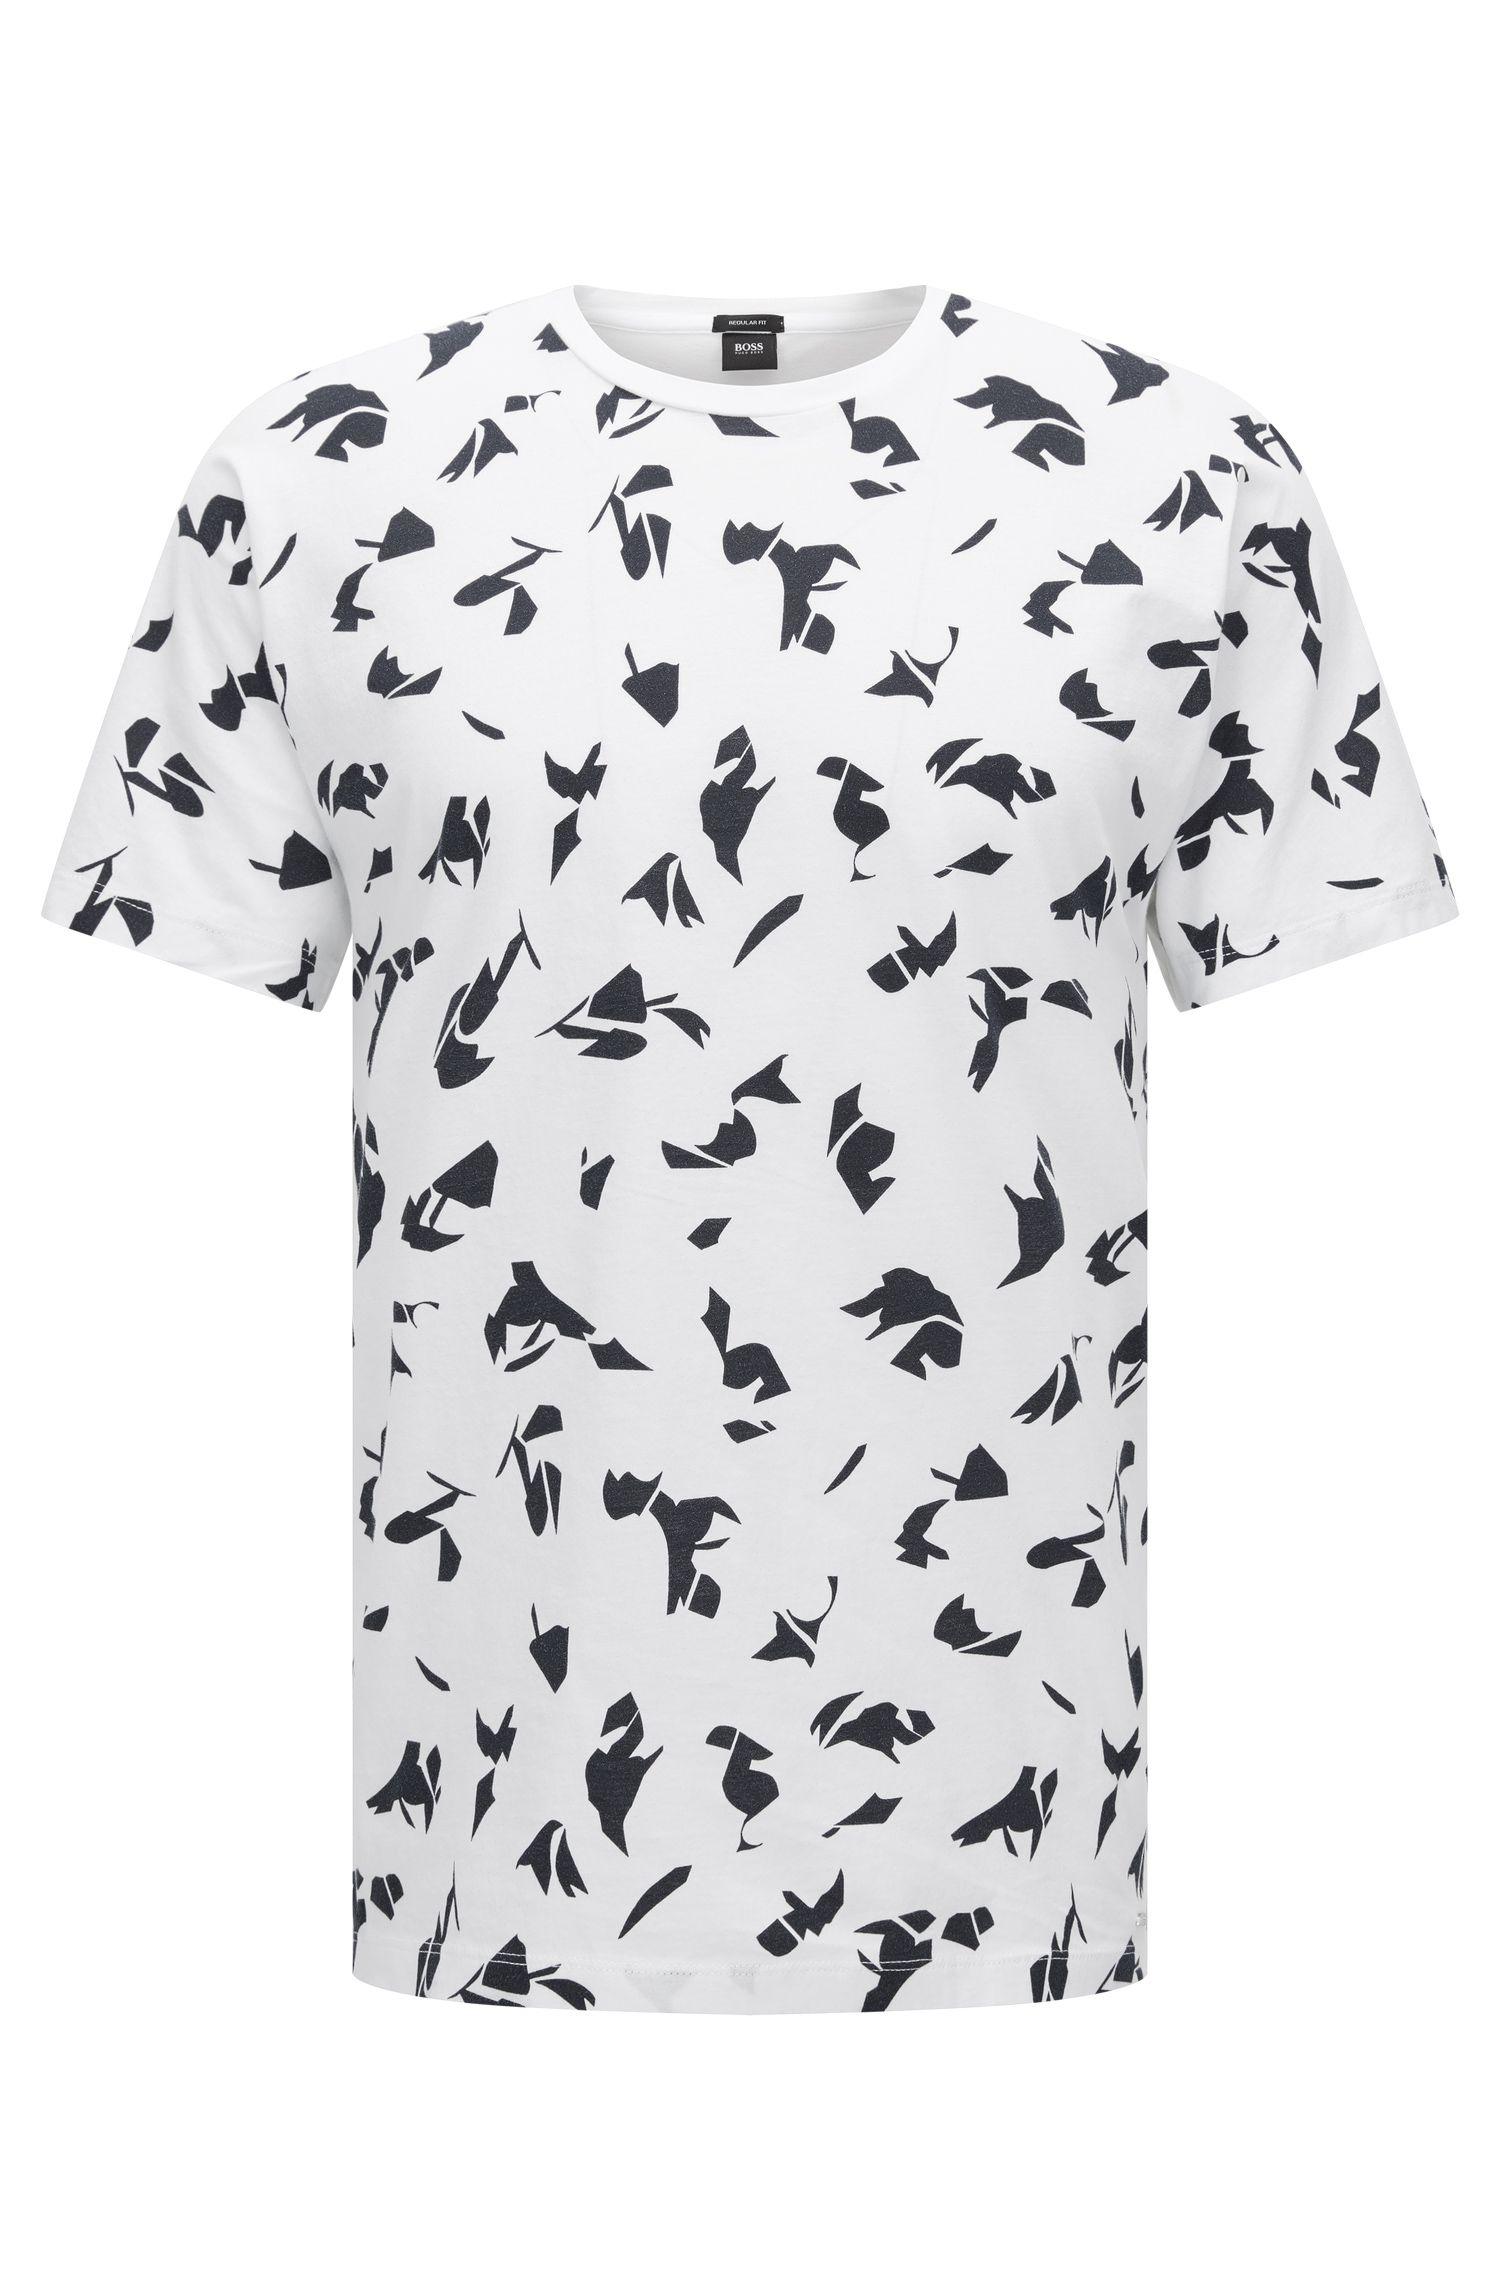 Patterned Cotton T-Shirt | Tiburt, White